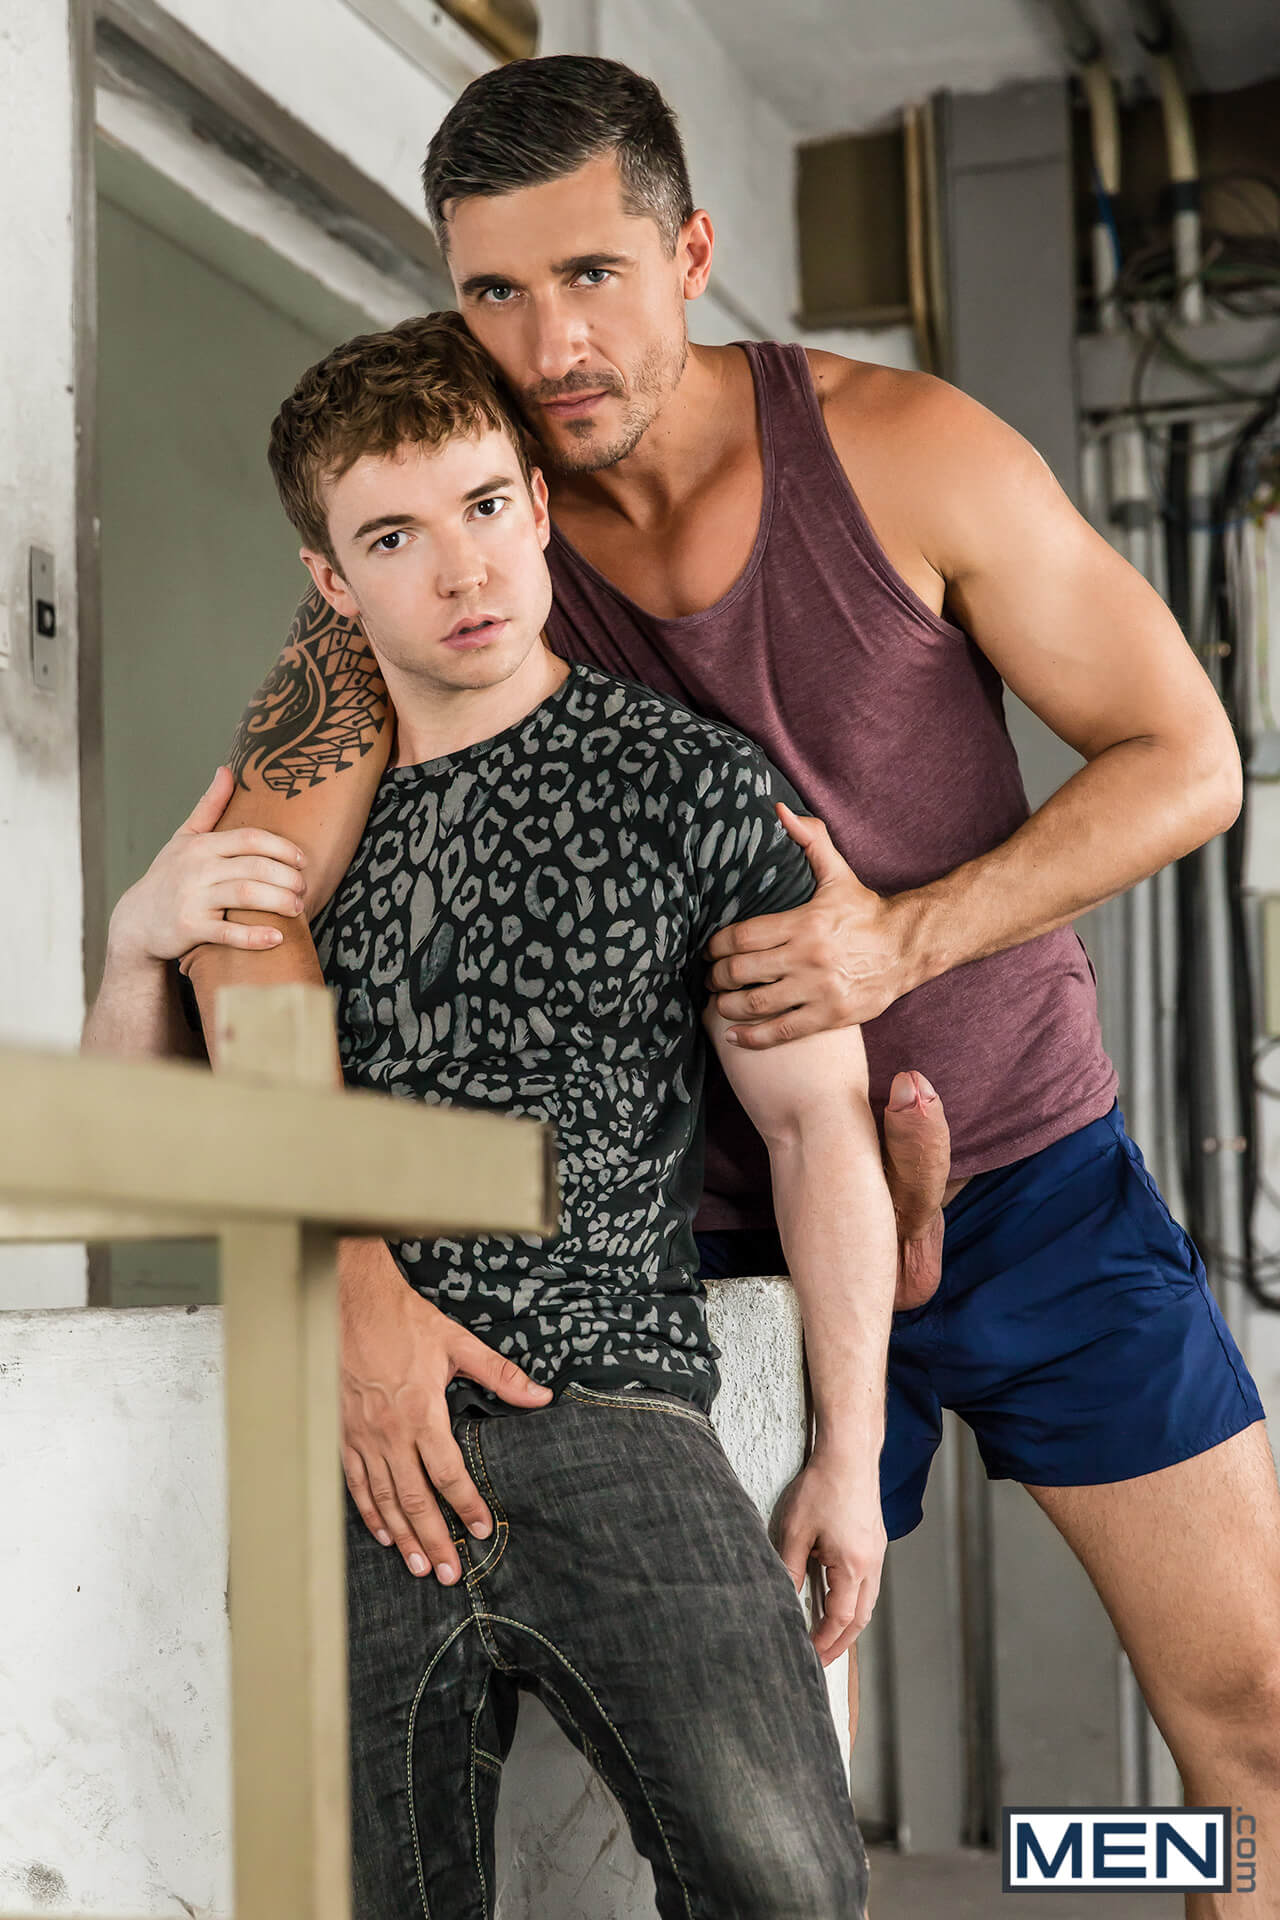 Men Super Gay Hero Sense A Gay Parody Part Gabriel Cross Jay Roberts Gay Porn Blog Image